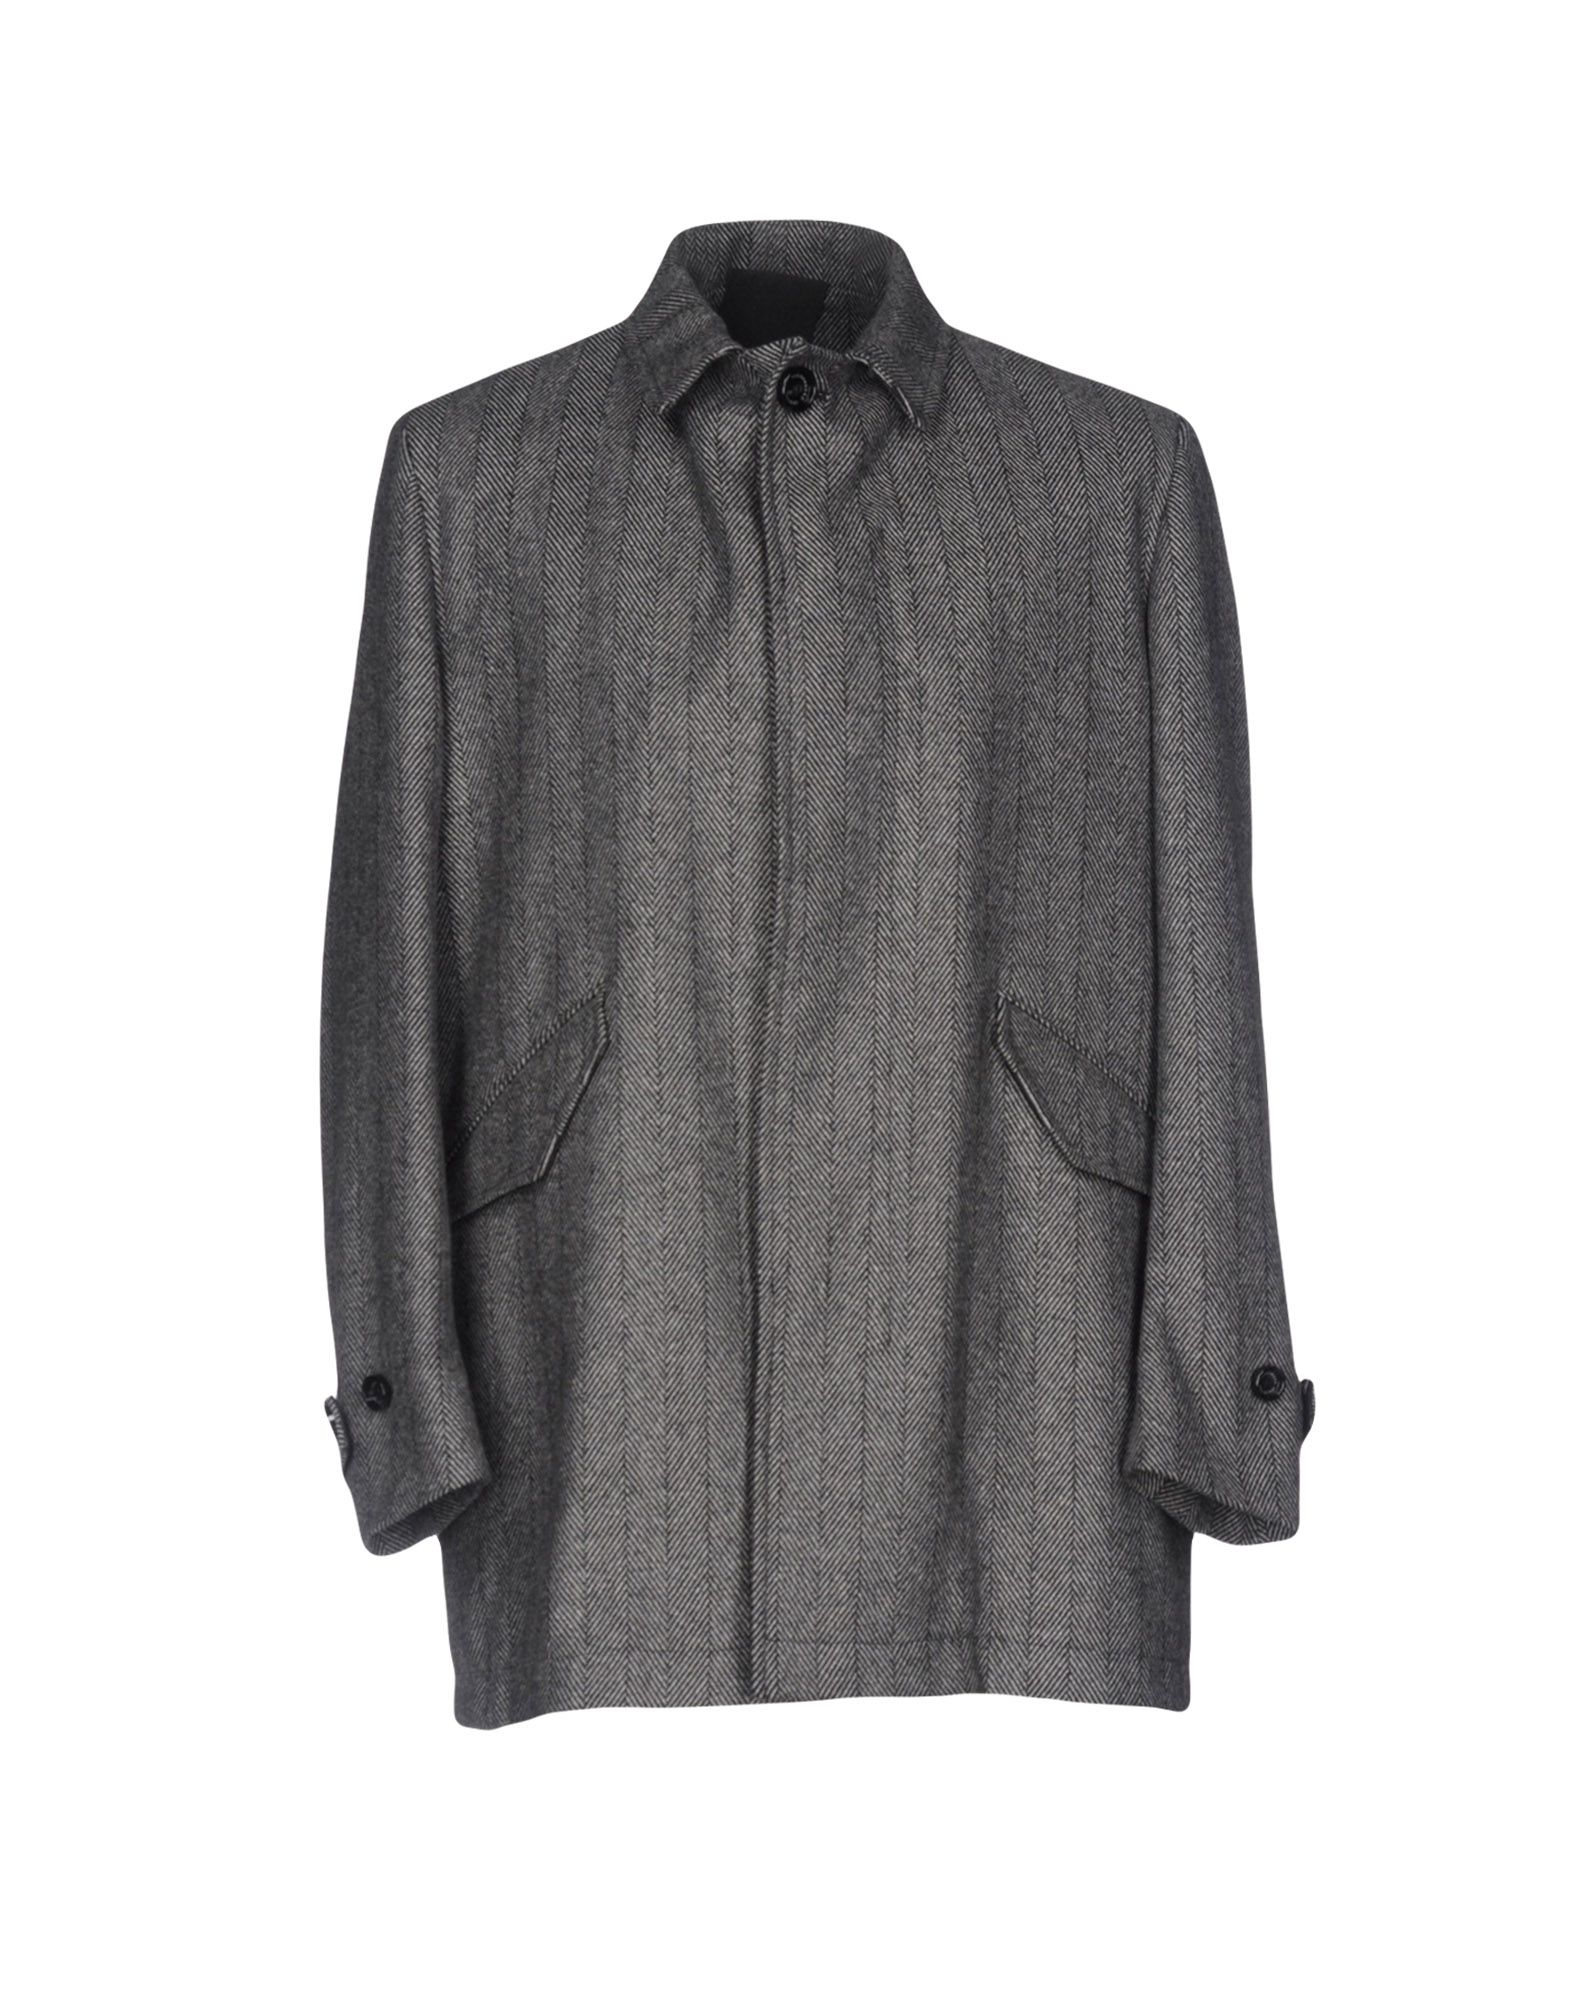 ALESSANDRO DELL´ACQUA Herren Mantel Farbe Grau Größe 4 - broschei